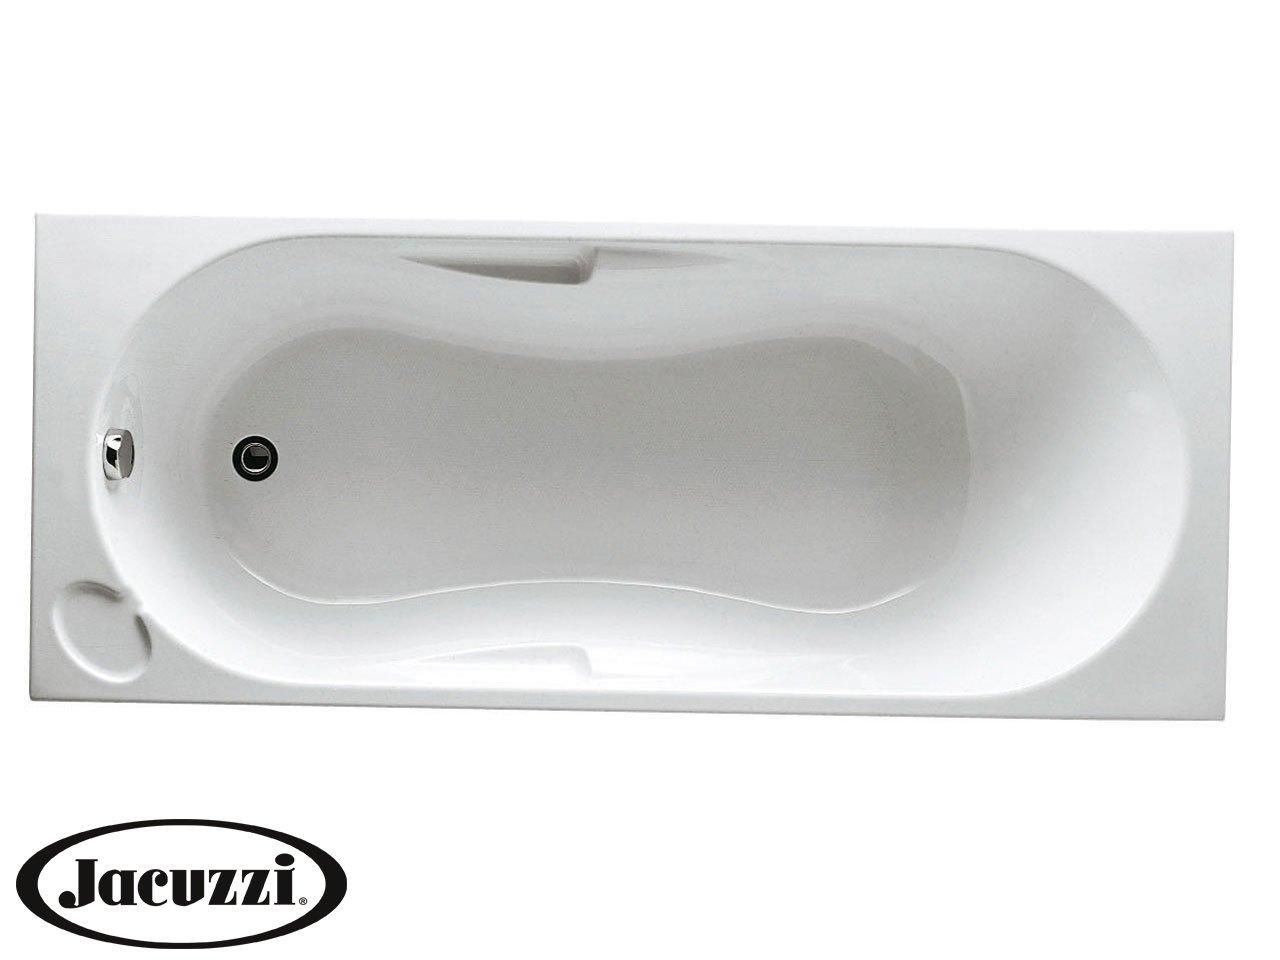 projecta by jacuzzi guscio incasso aira 170x70 bianco eu